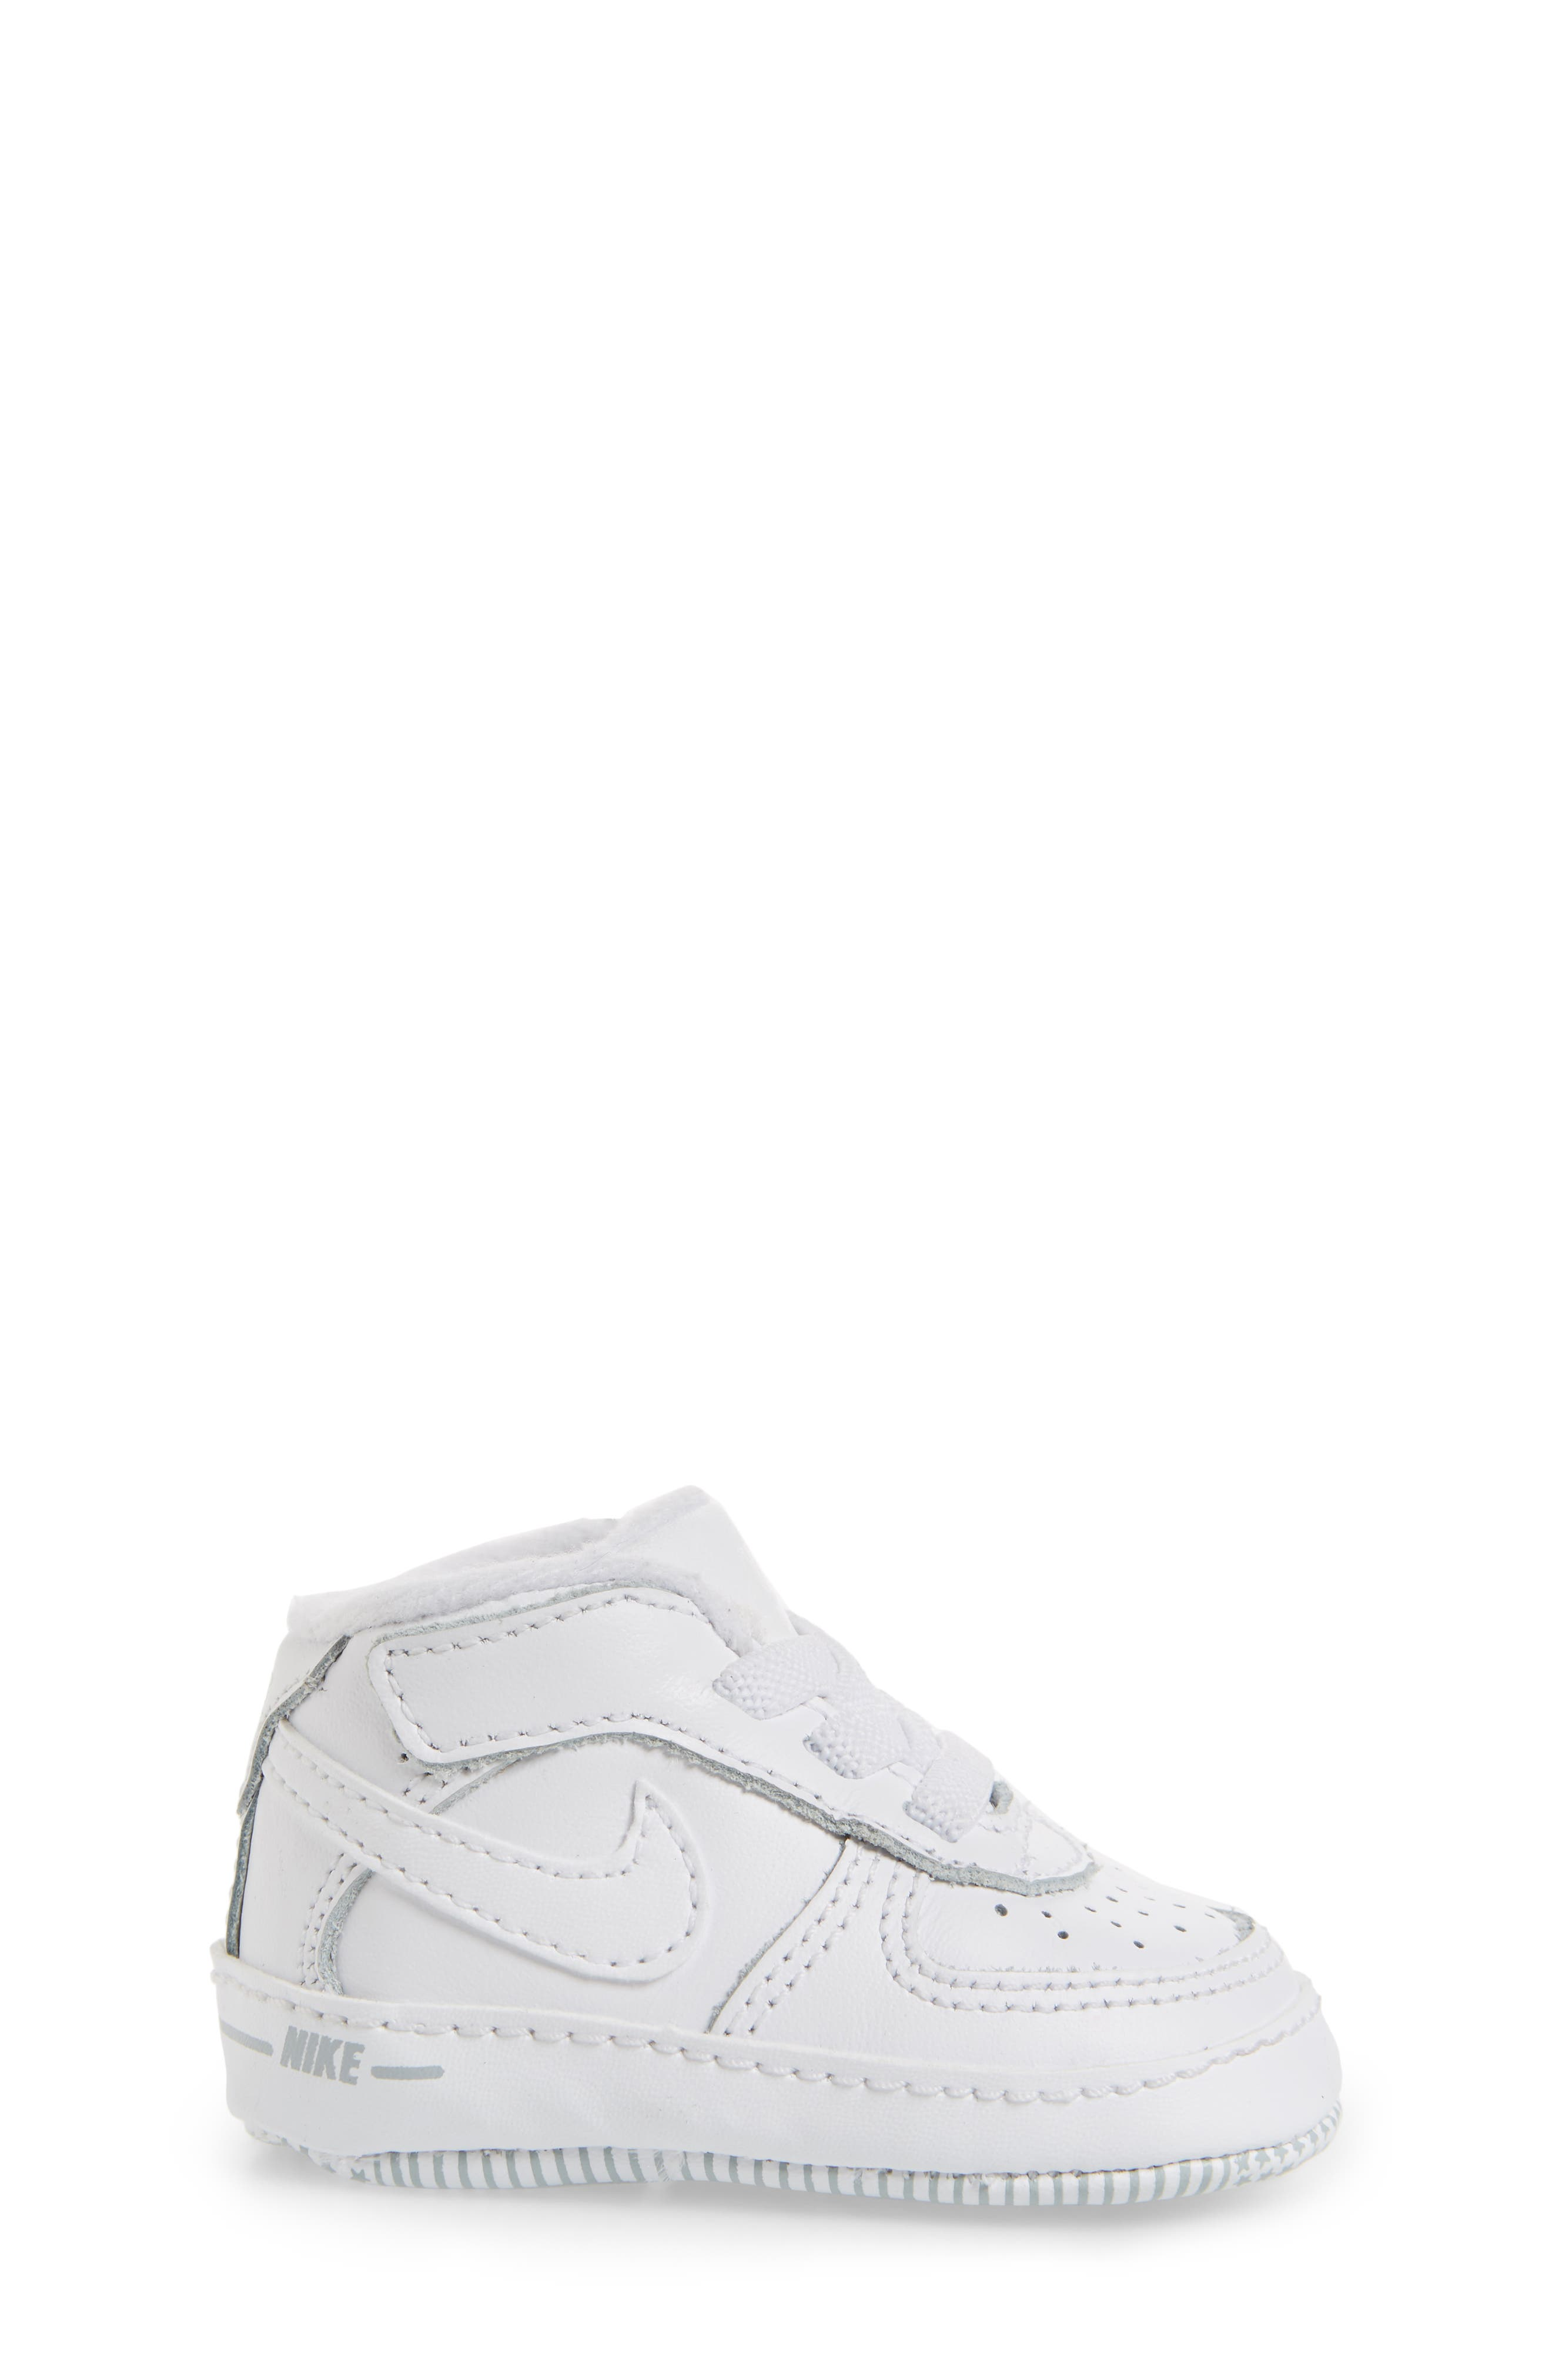 NIKE,                             Air Force 1 Sneaker,                             Alternate thumbnail 3, color,                             WHITE/ WHITE/ WHITE